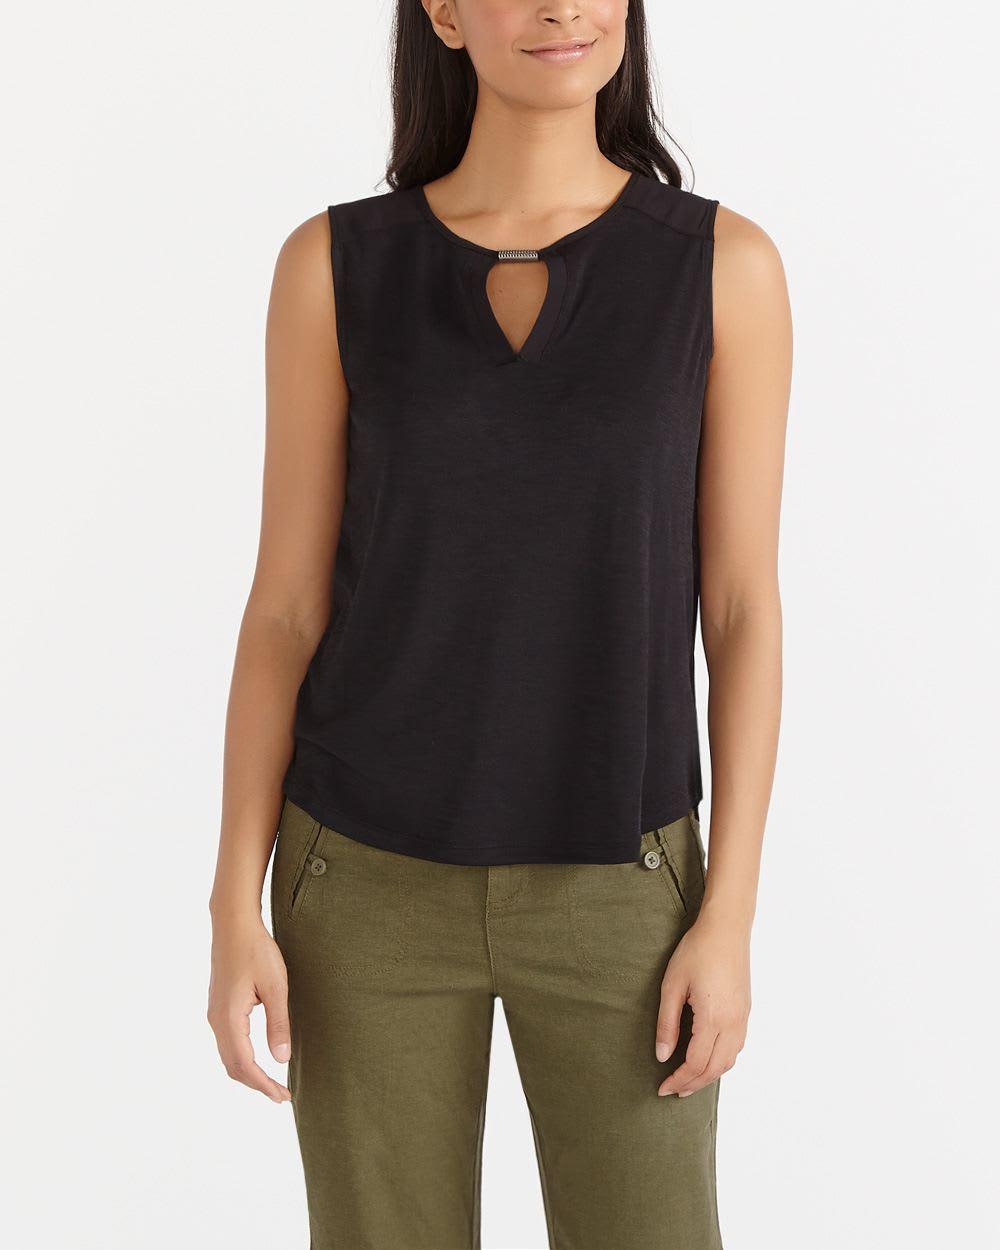 Petite sleeveless tops #13